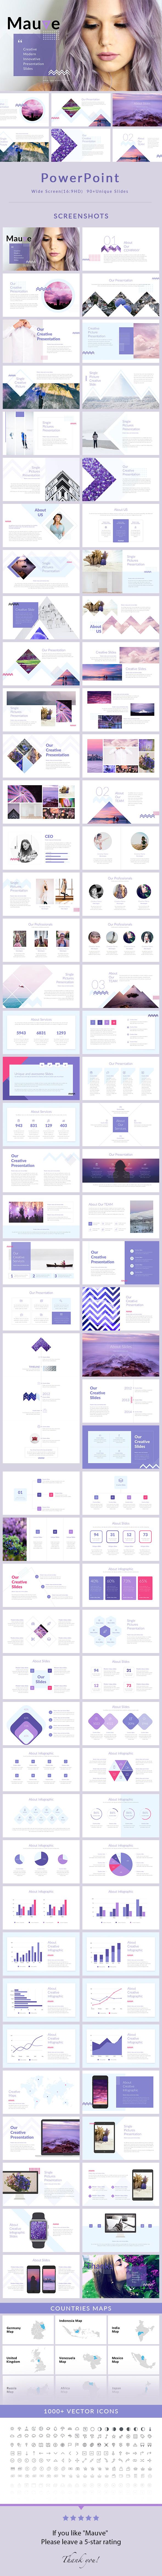 Mauve - PowerPoint Presentation Template - Creative PowerPoint Templates